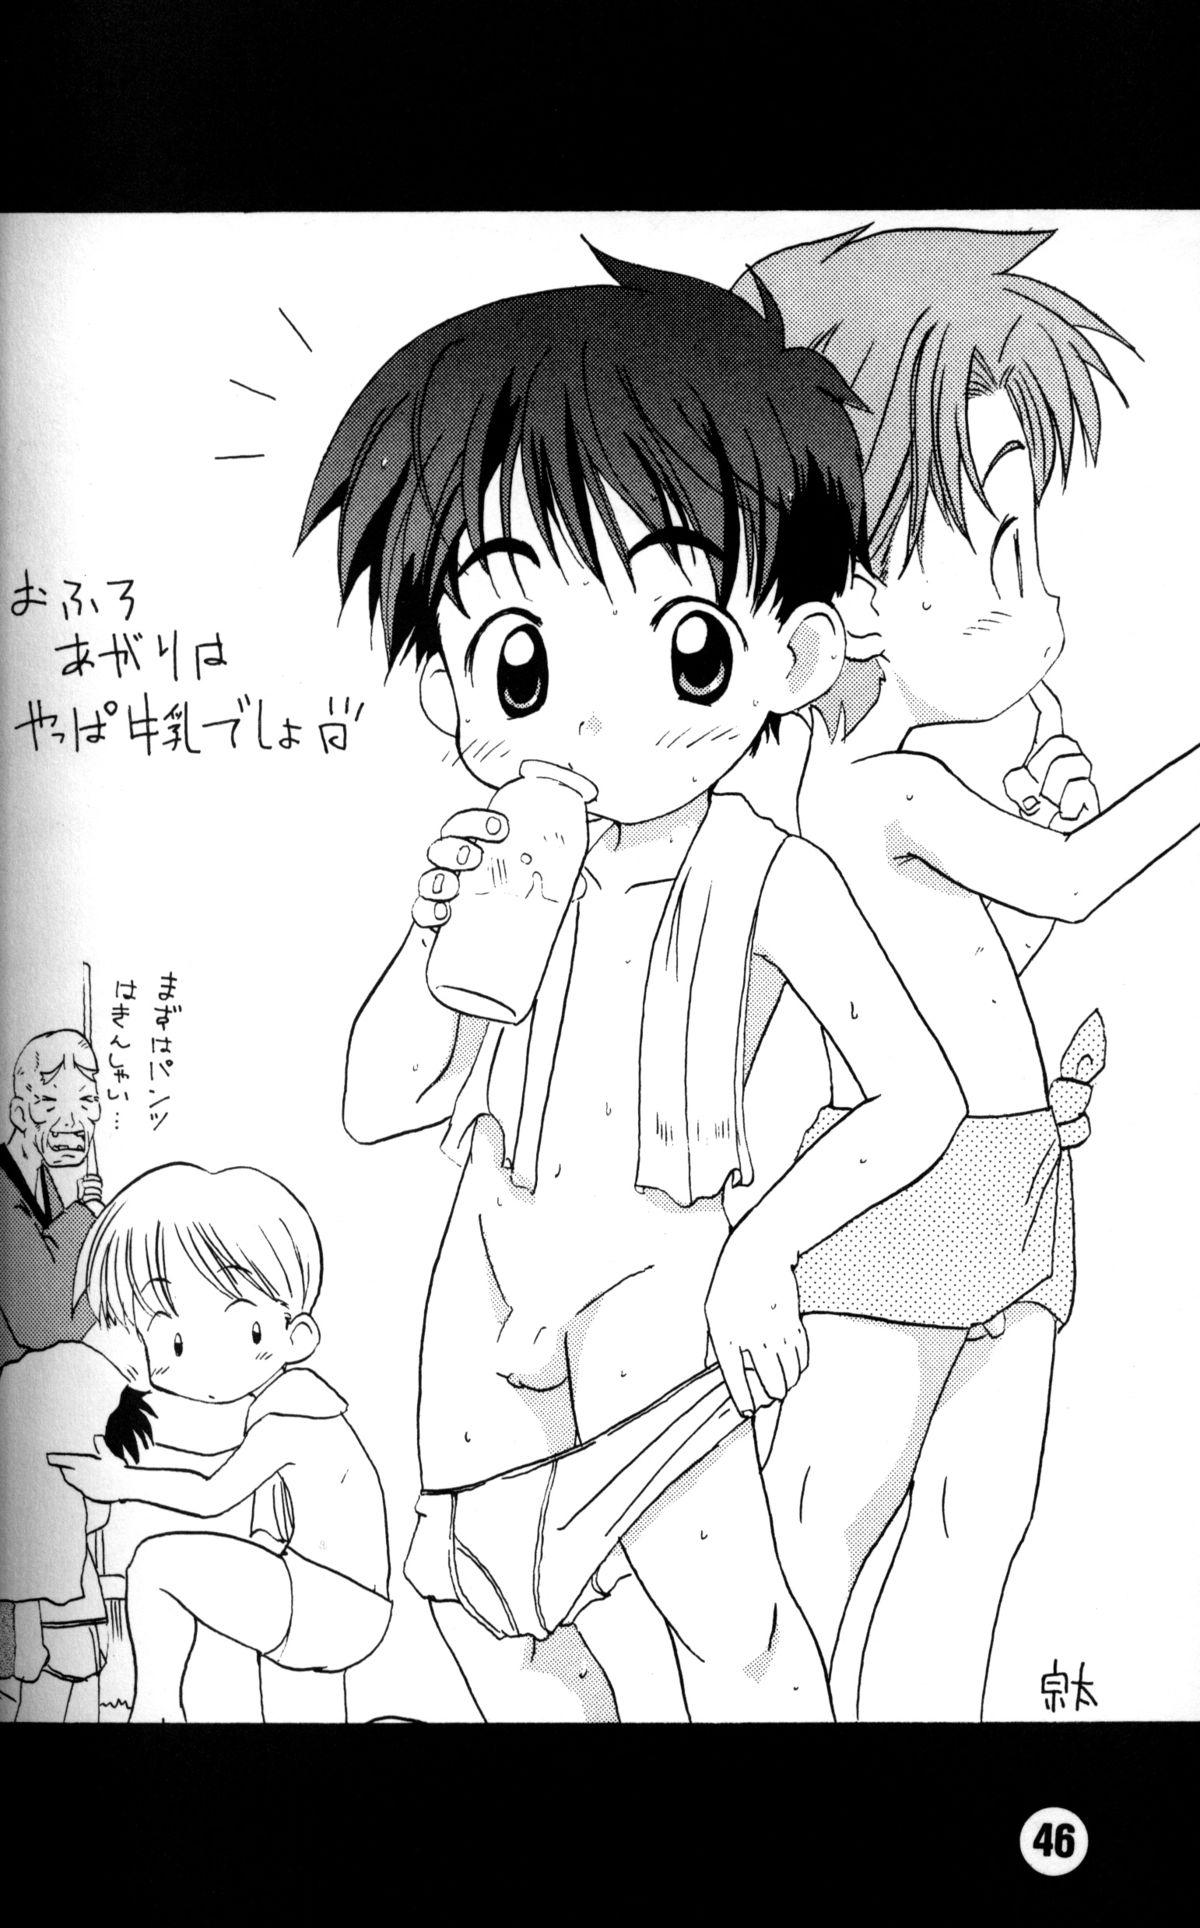 Anthology - Nekketsu Project - Volume 4 'Shounen Vanilla Essence' 44